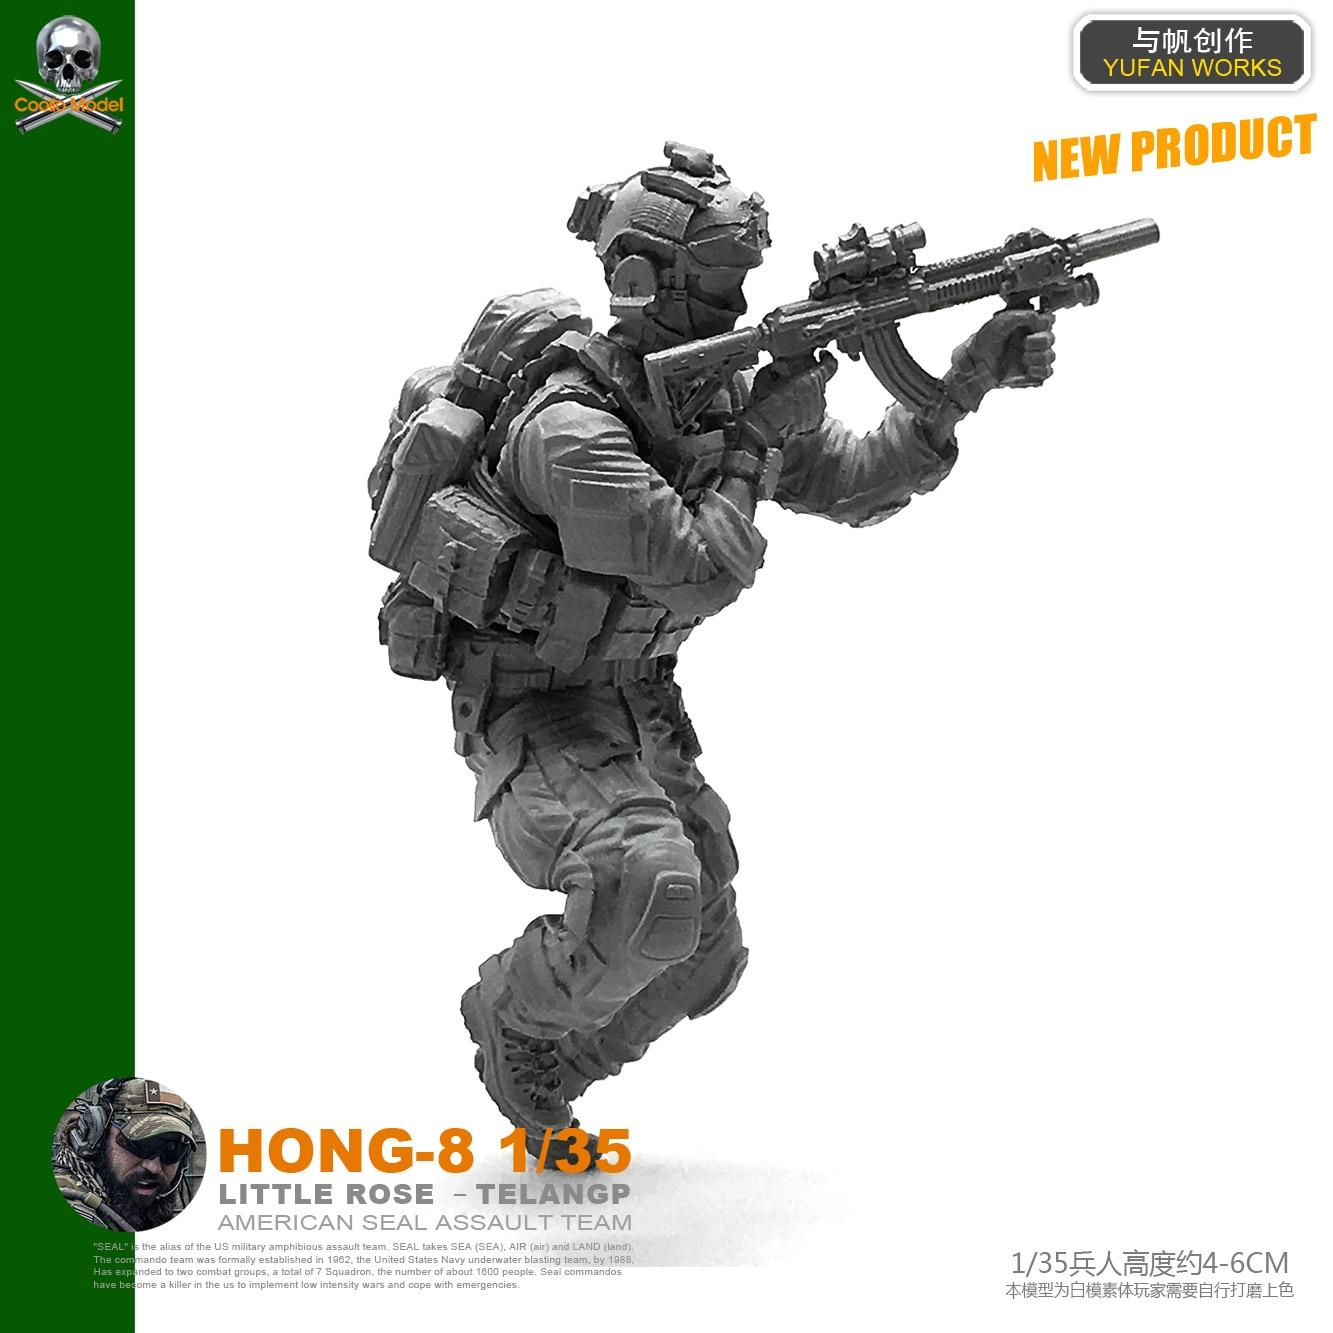 Yufan Model 1/35 Figure Resin Soldier  Model Kits Unmounted Hong-08